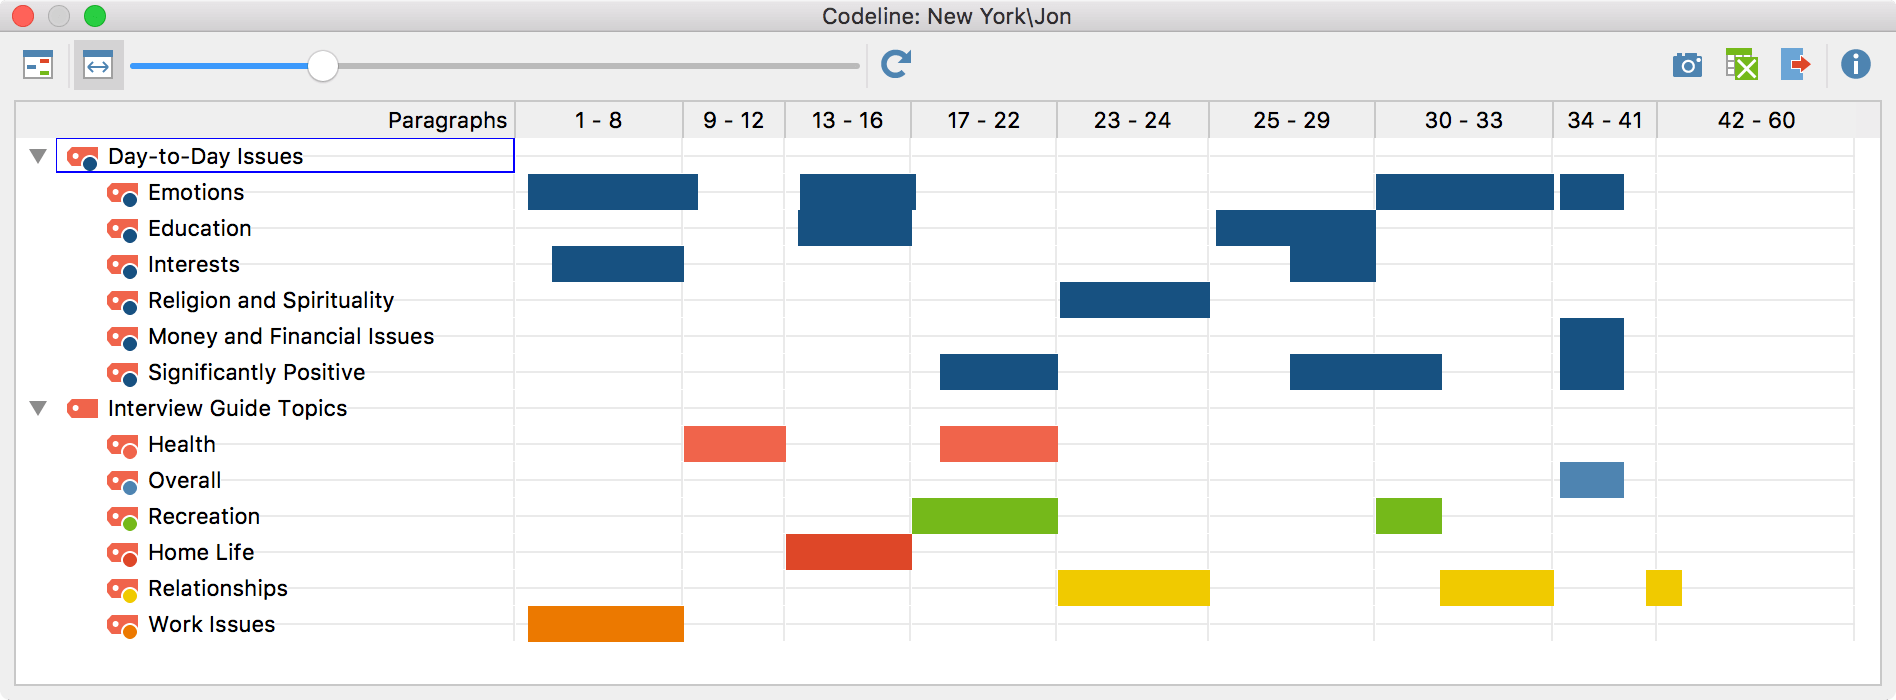 maxqda-codeline-visualization